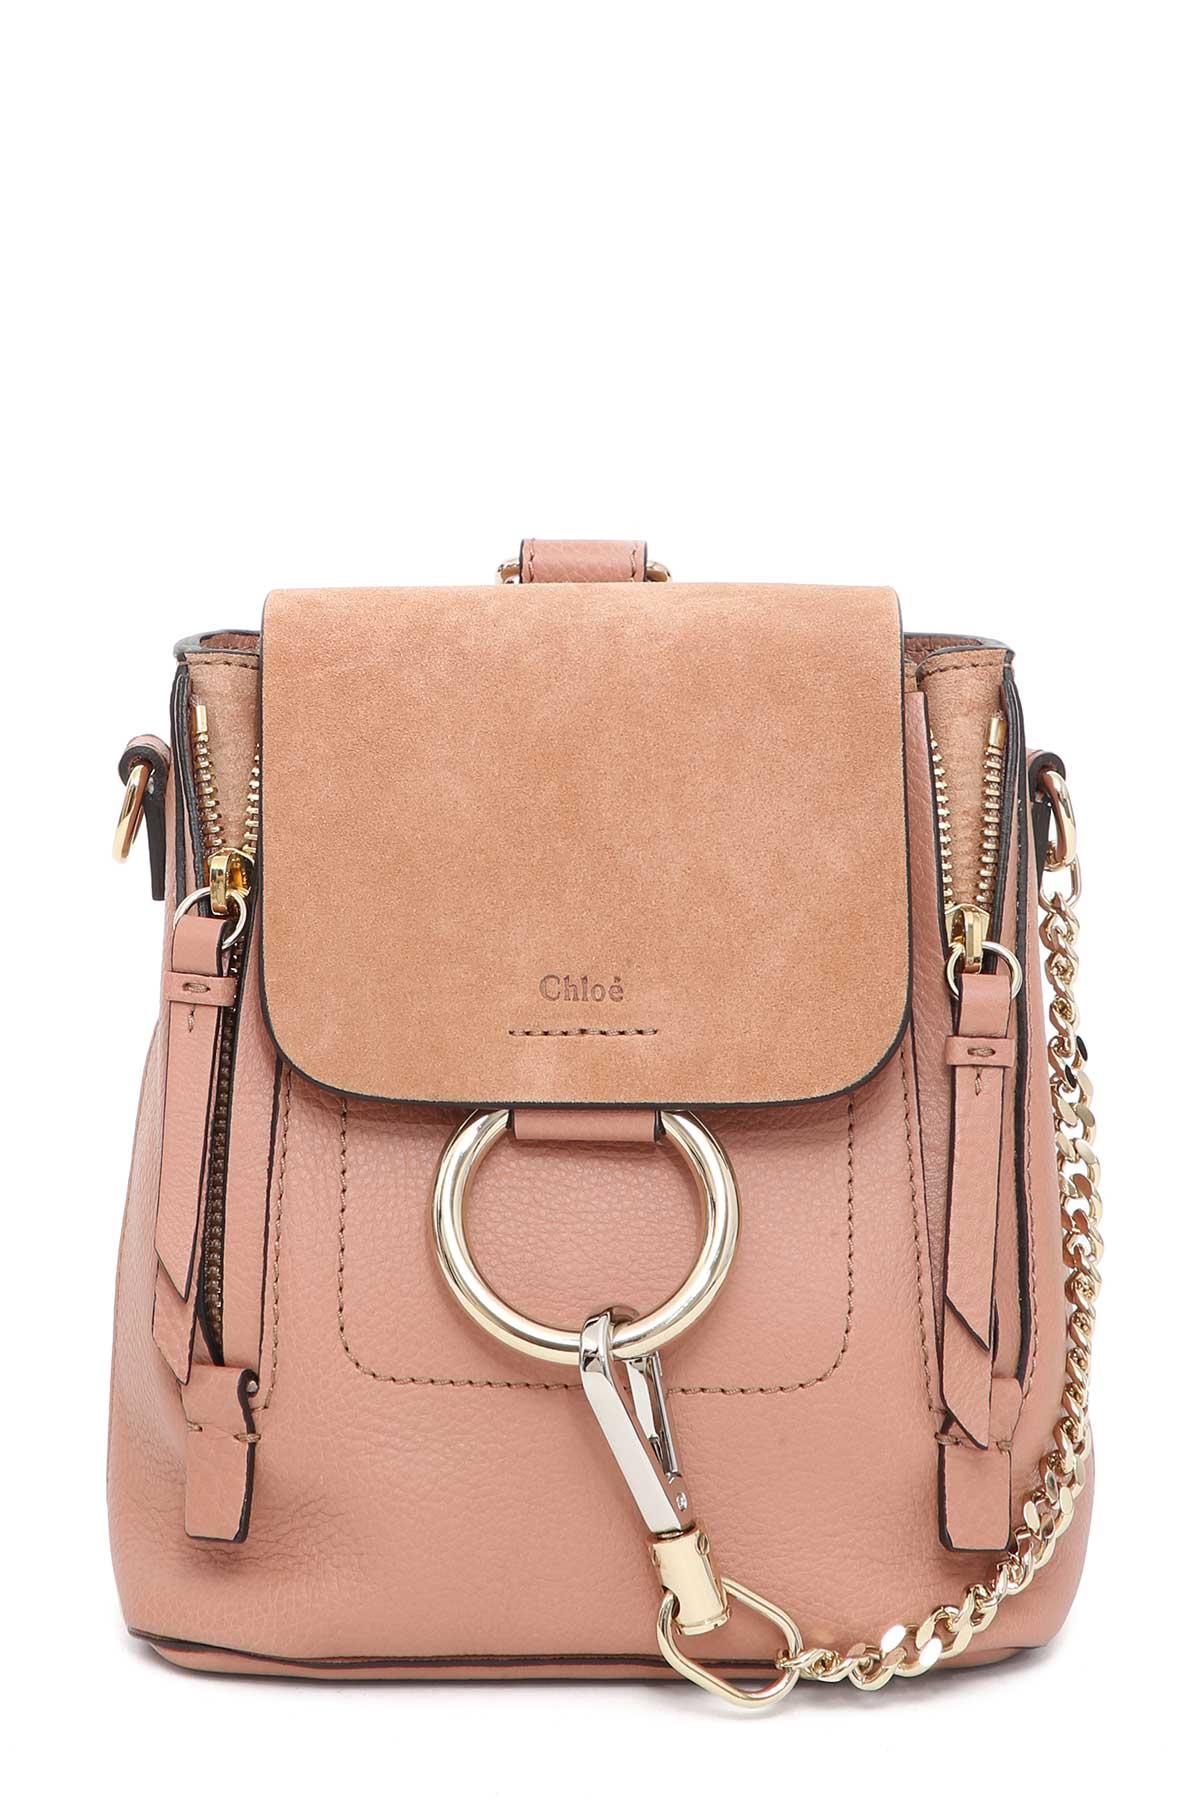 chlo chlo chlo 39 faye 39 mini backpack rosa women 39 s backpacks italist. Black Bedroom Furniture Sets. Home Design Ideas